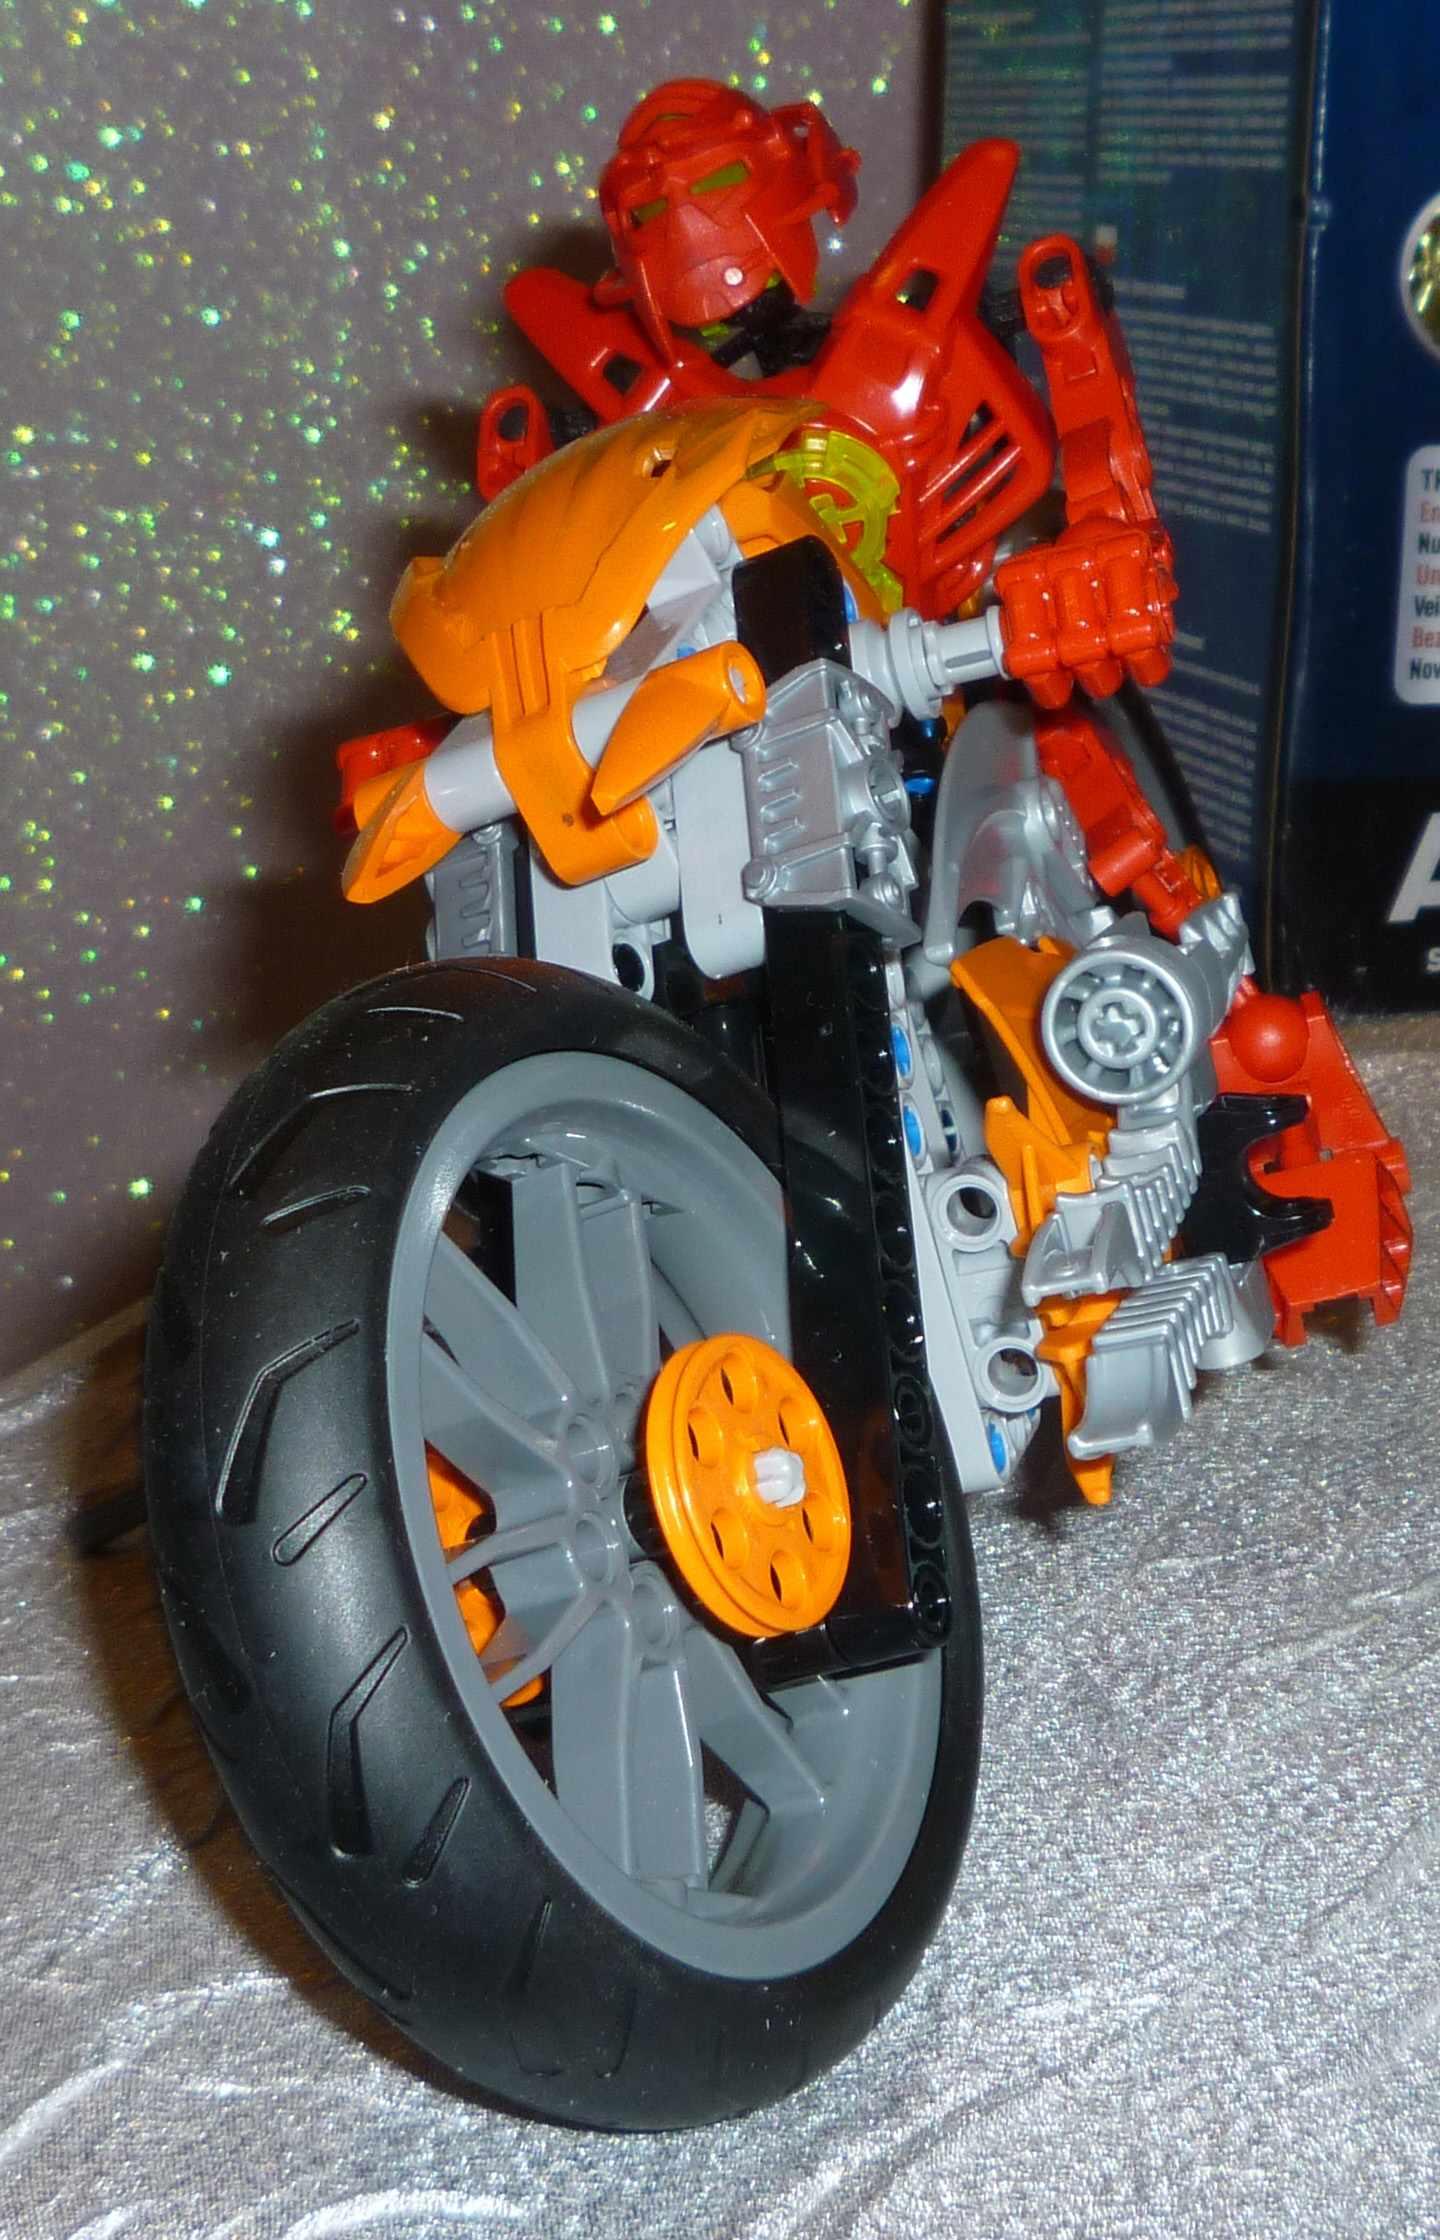 hamleys-top-toys-for-2010_13476